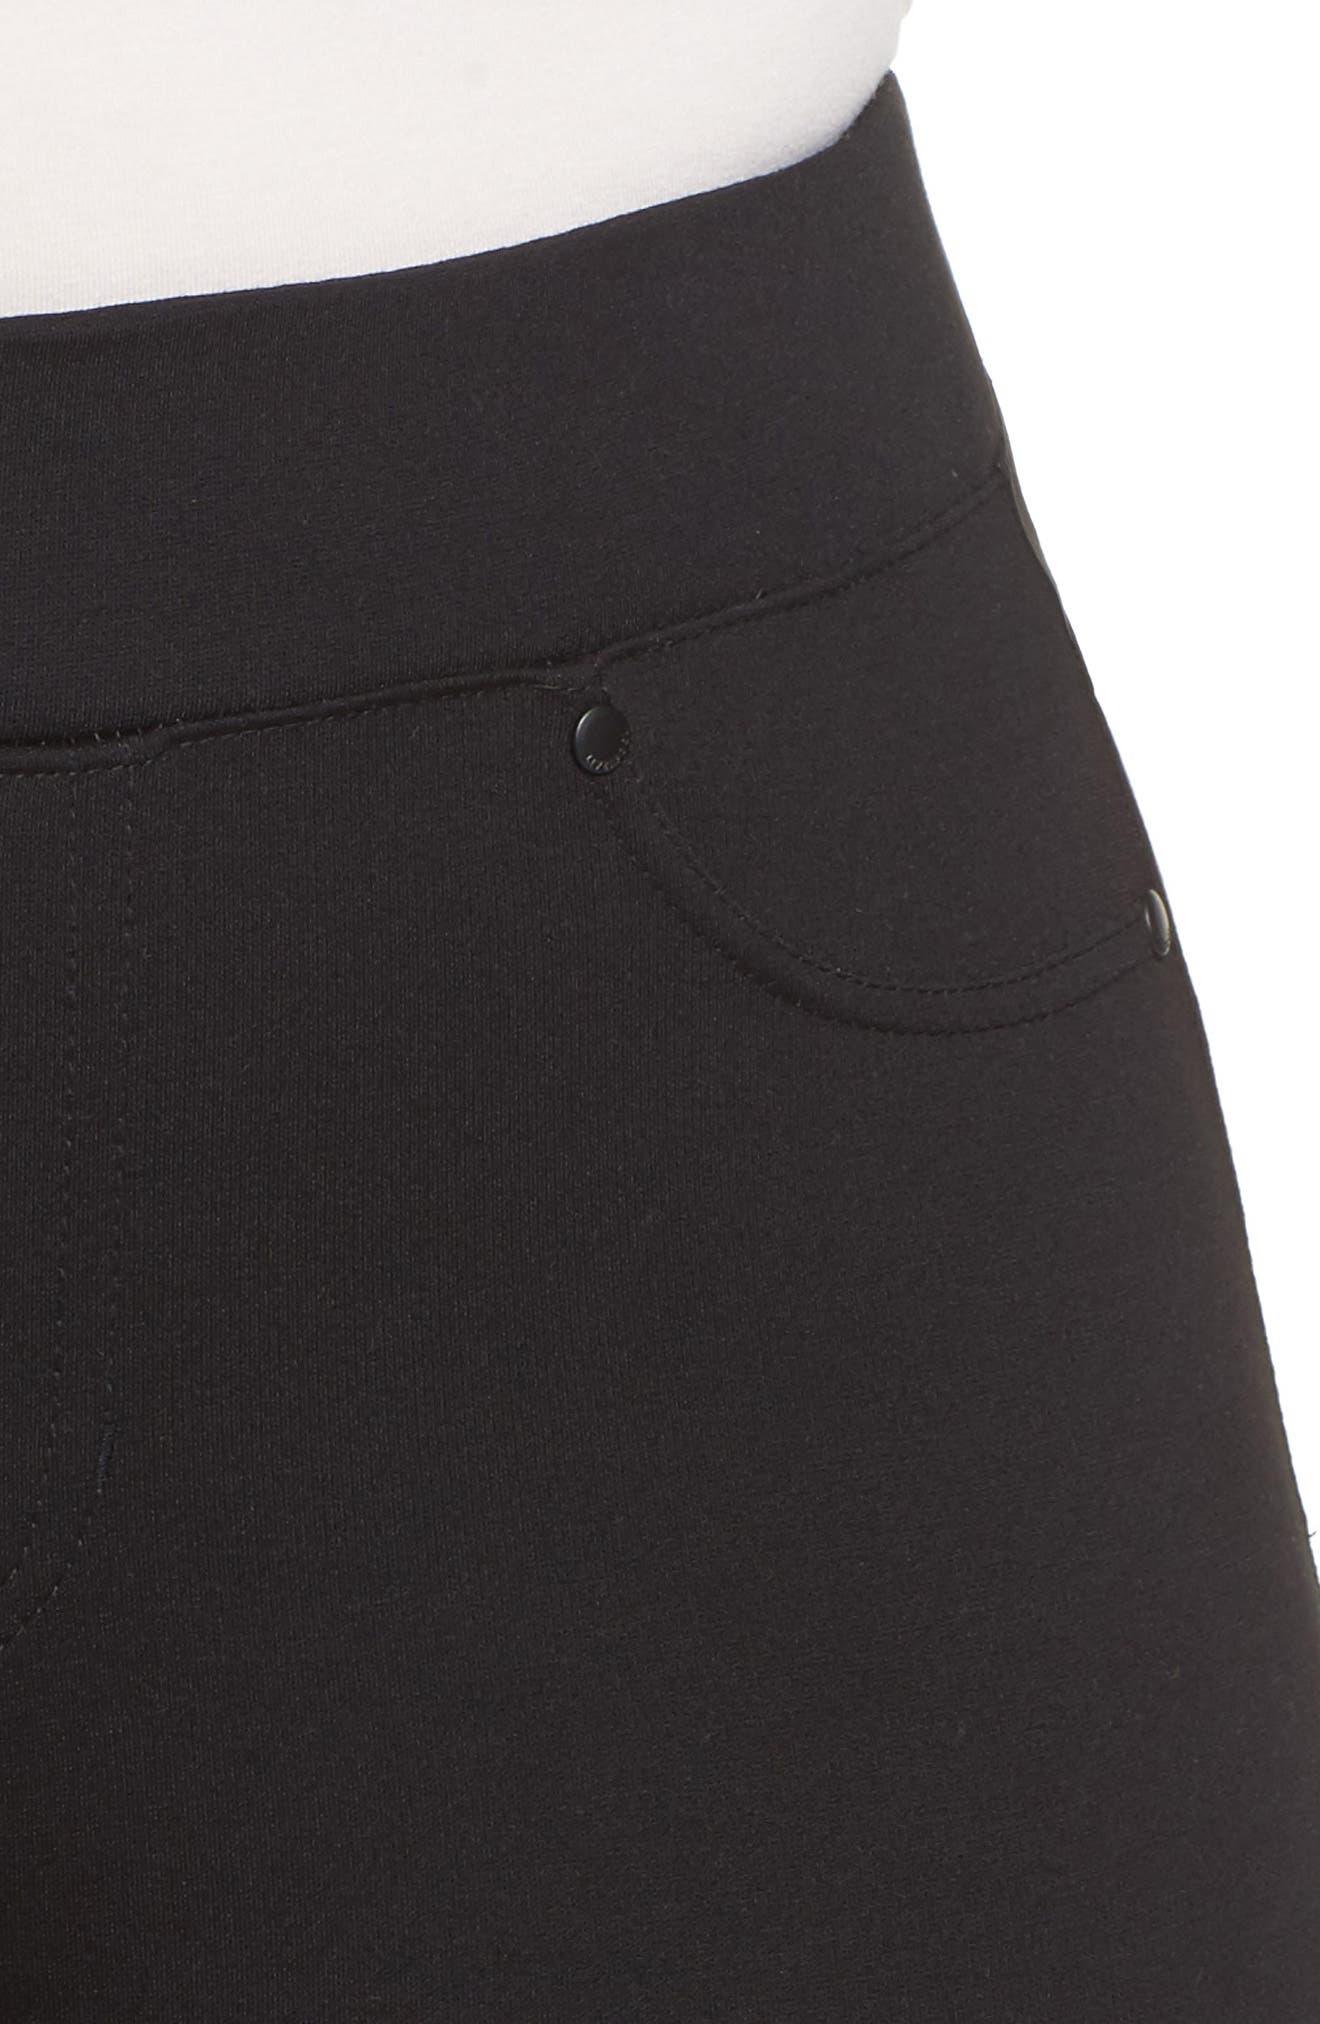 Ponte Knit Leggings,                             Alternate thumbnail 4, color,                             BLACK